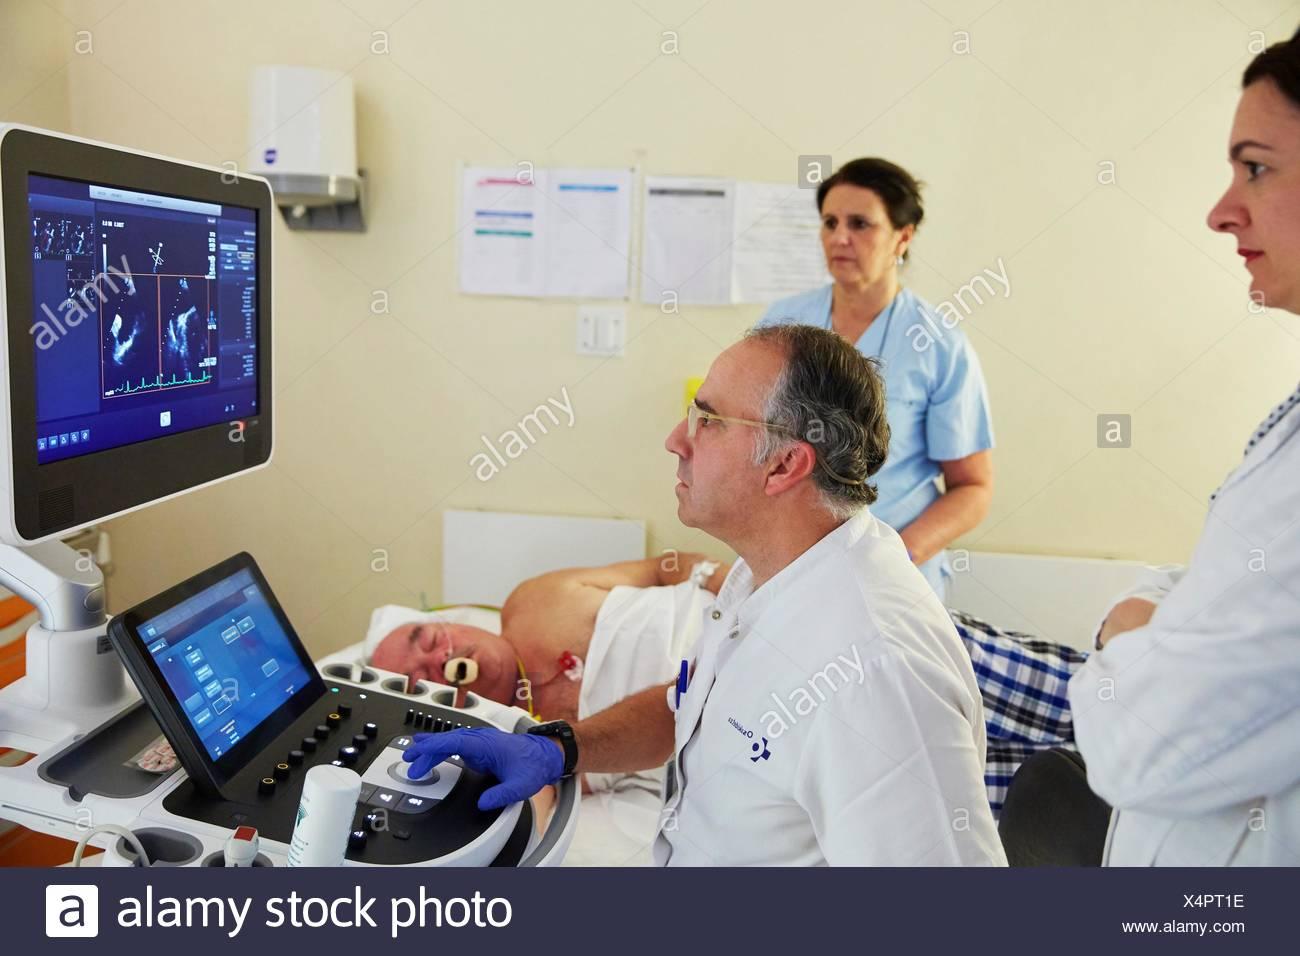 3D cardiac ultrasound, Hospital Donostia, San Sebastian, Gipuzkoa, Basque Country, Spain - Stock Image